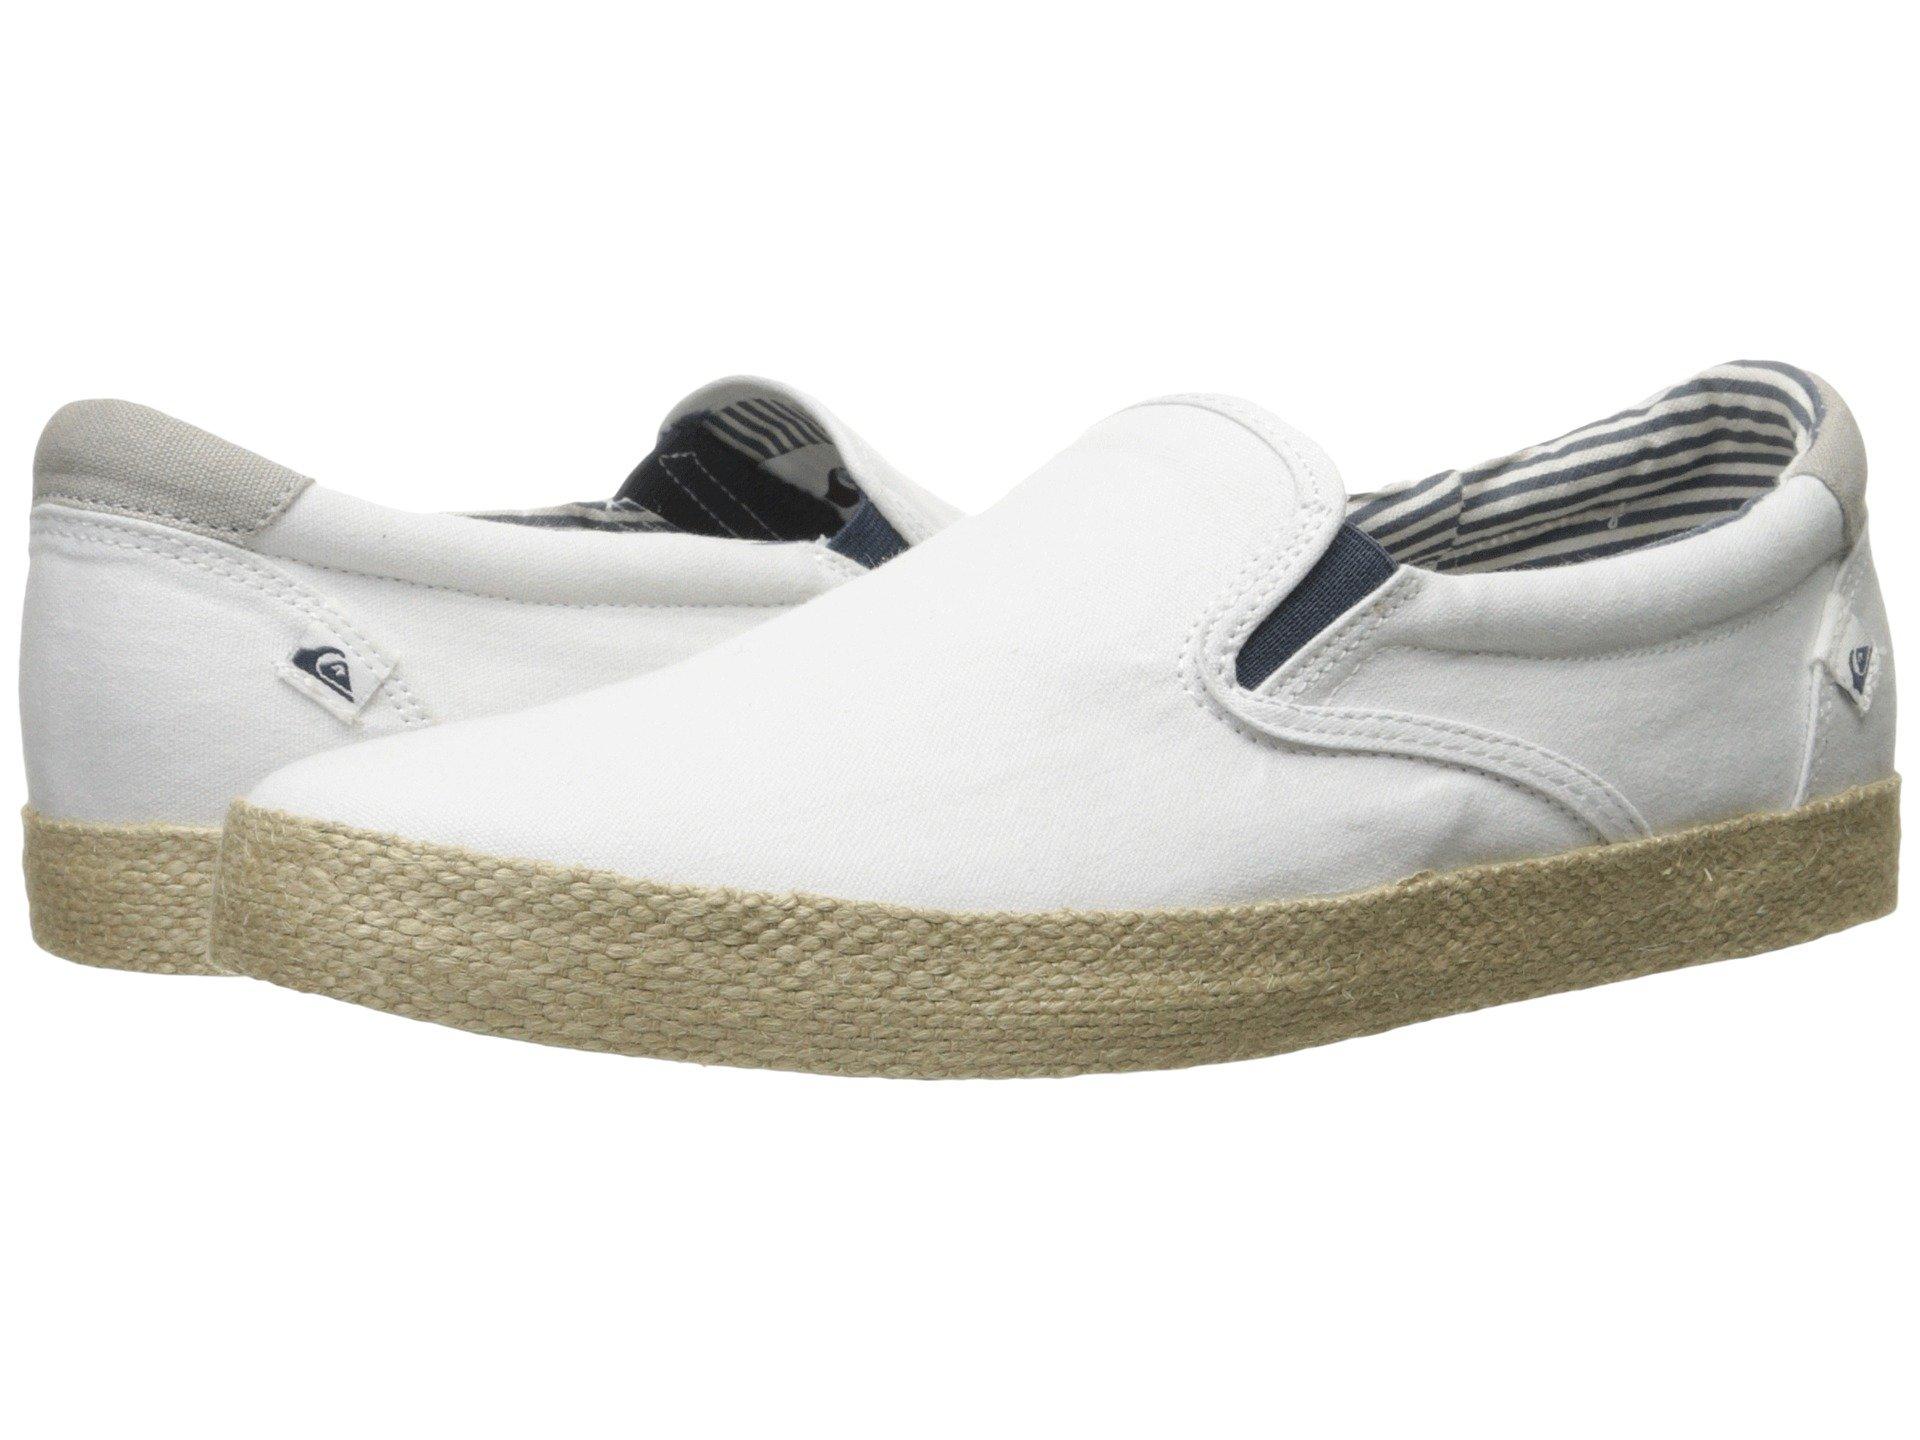 Tenis para Hombre Quiksilver Shorebreak Slip-On ESP  + Quiksilver en VeoyCompro.net